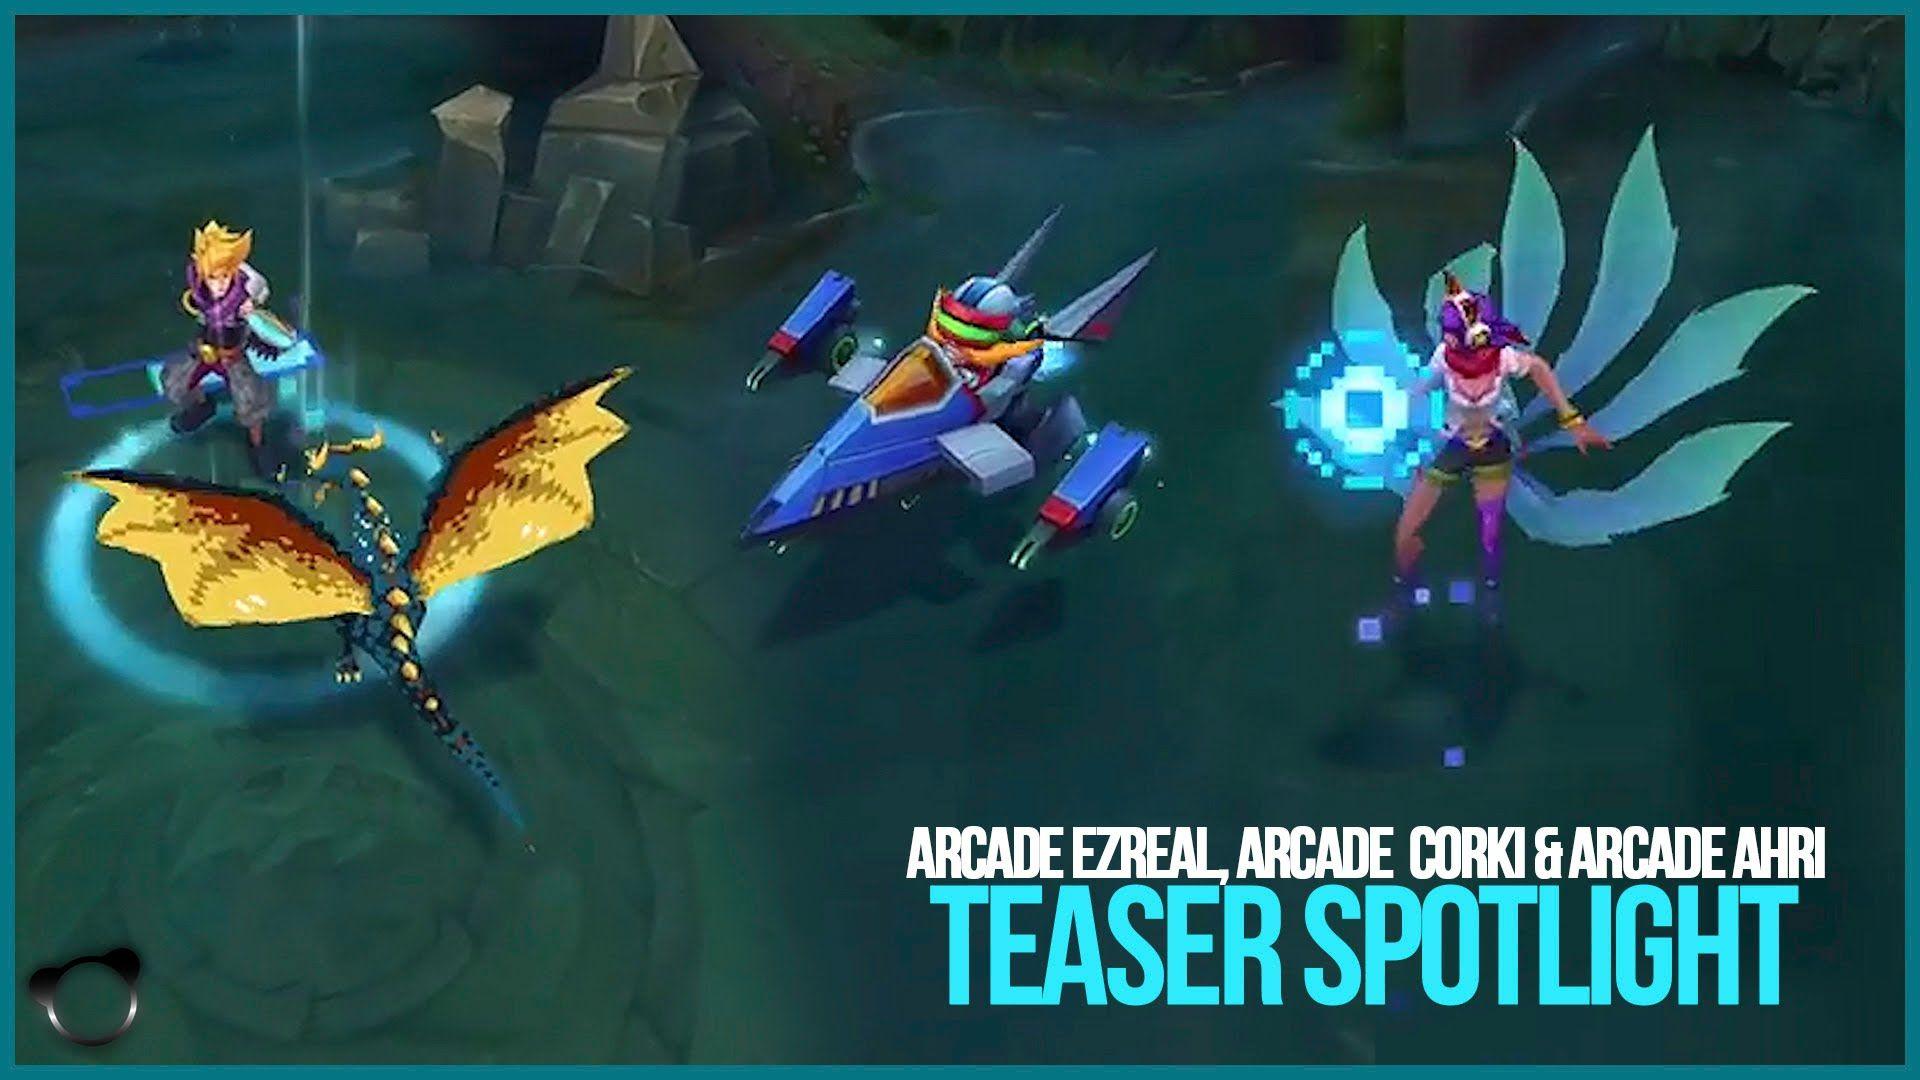 League Of Legends Arcade Ahri Wallpaper Gamers Wallpaper 1080p